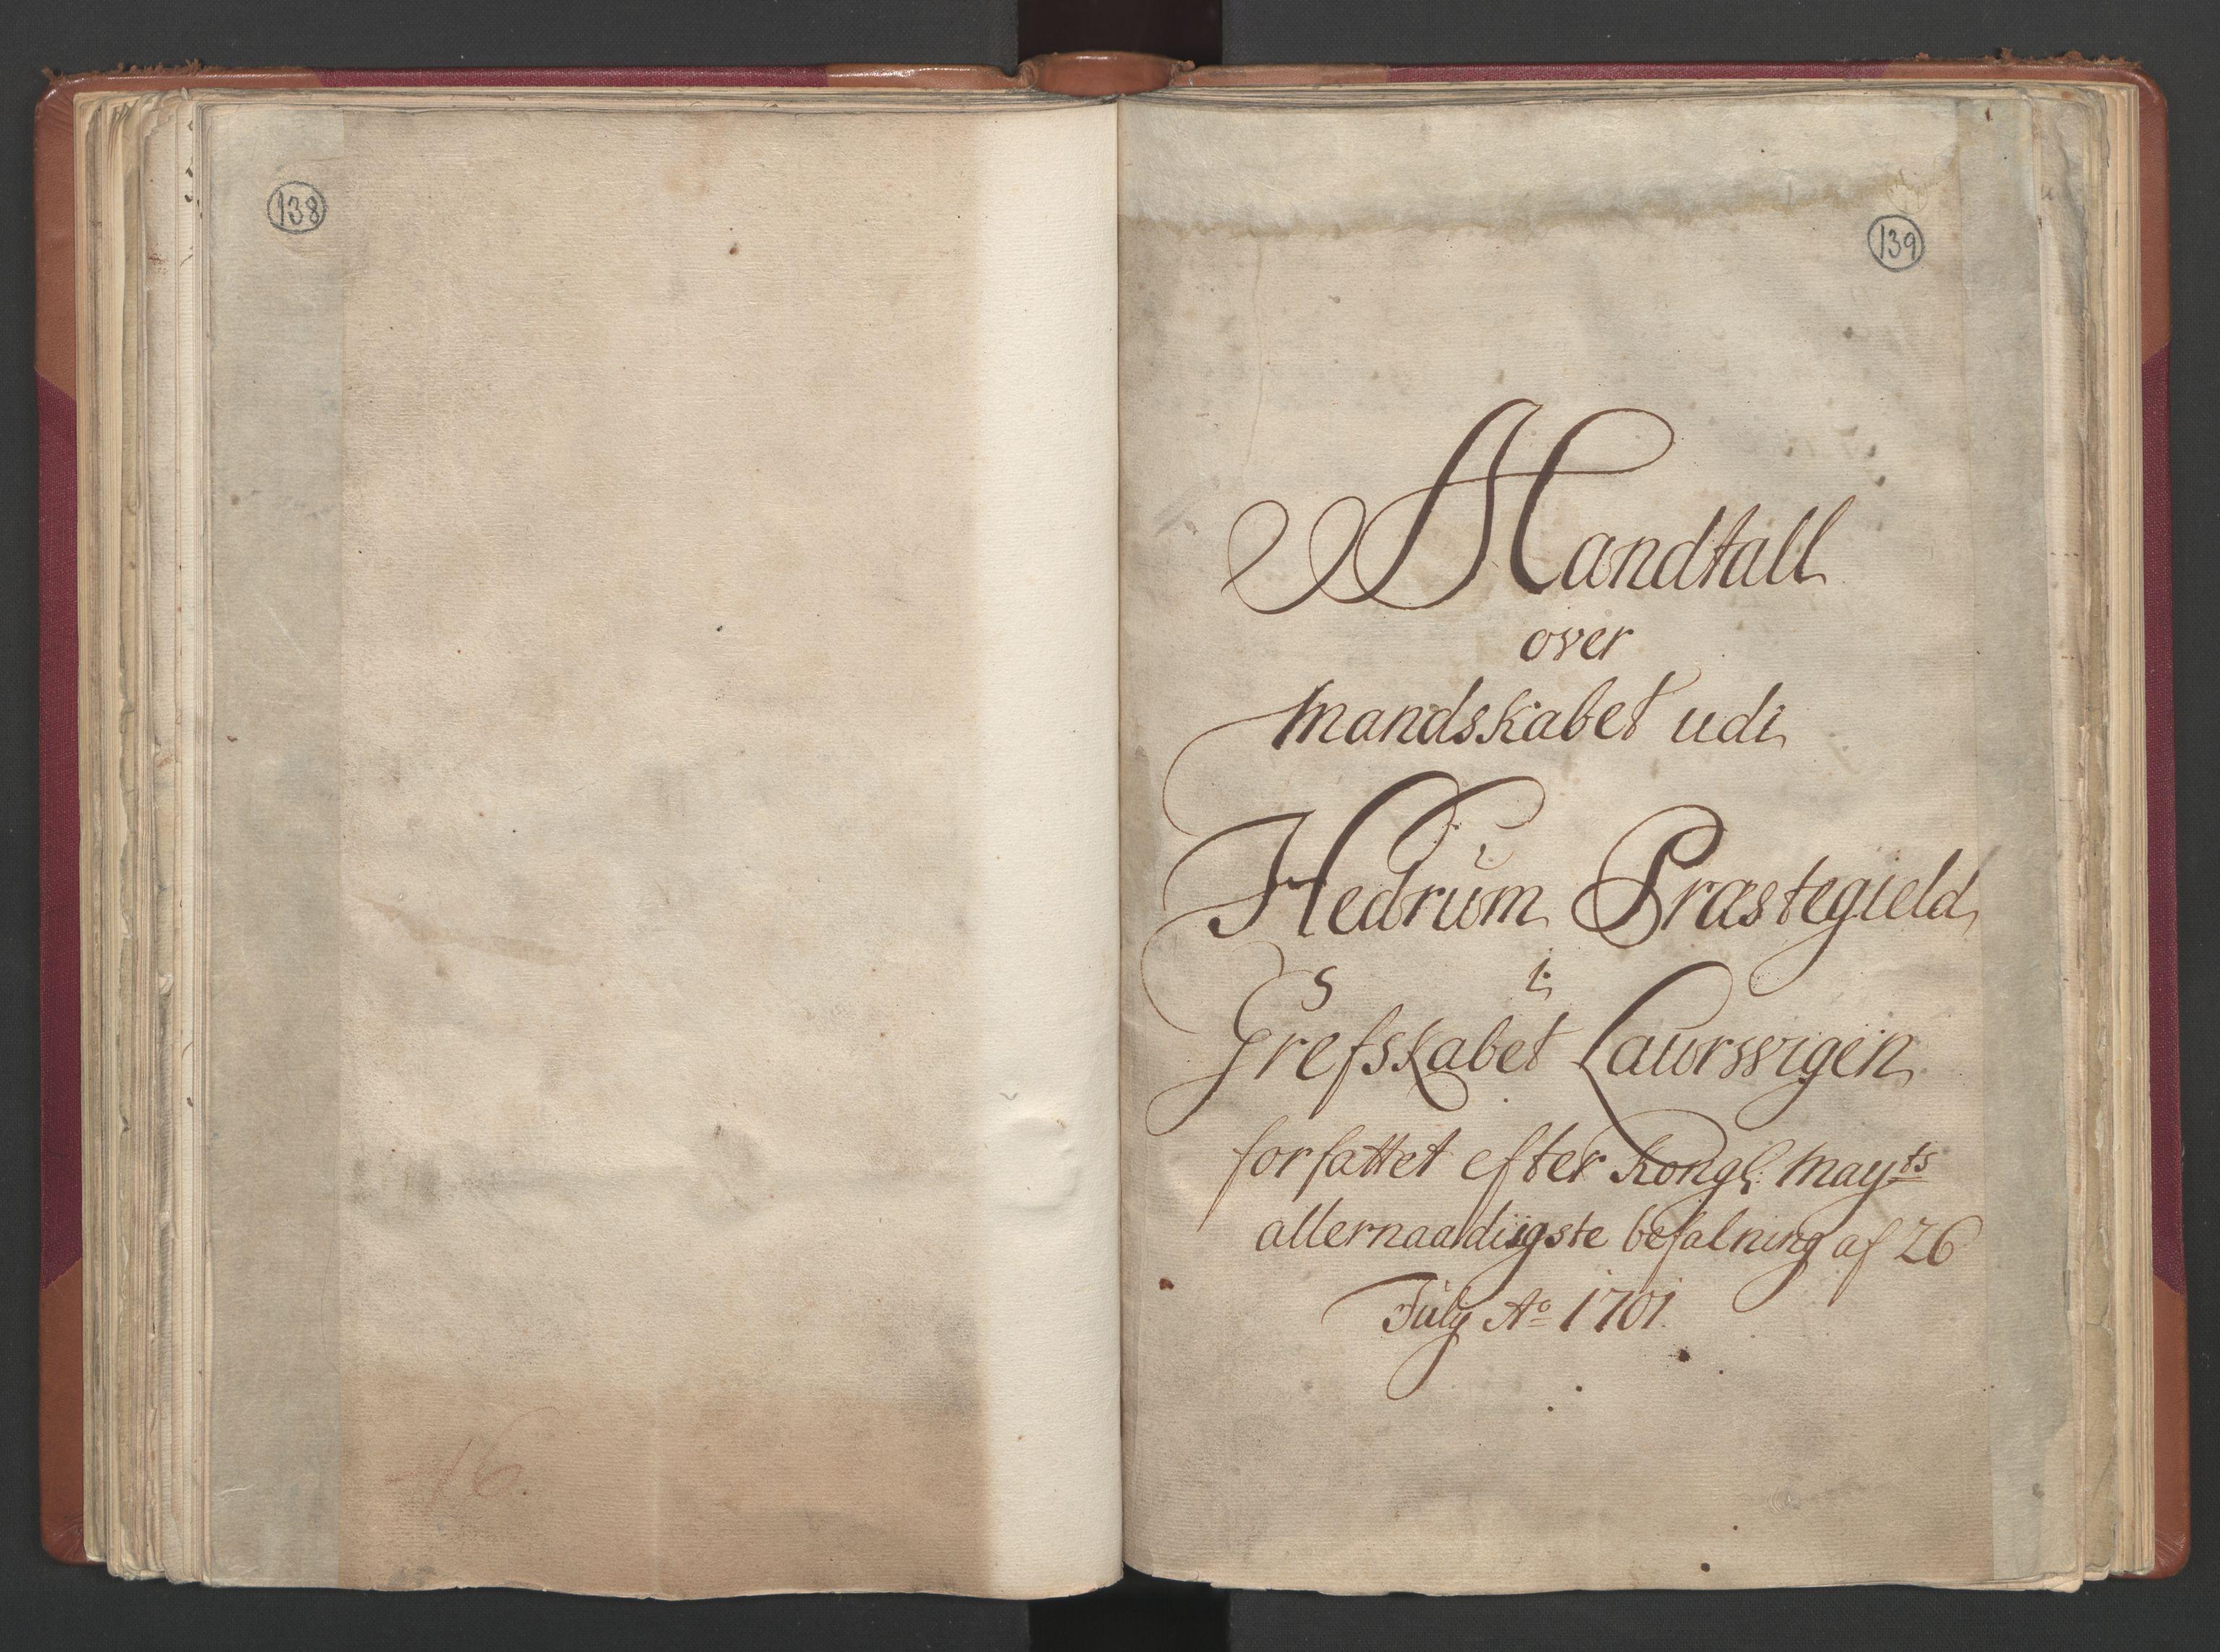 RA, Manntallet 1701, nr. 2: Solør, Odal og Østerdal fogderi og Larvik grevskap, 1701, s. 138-139